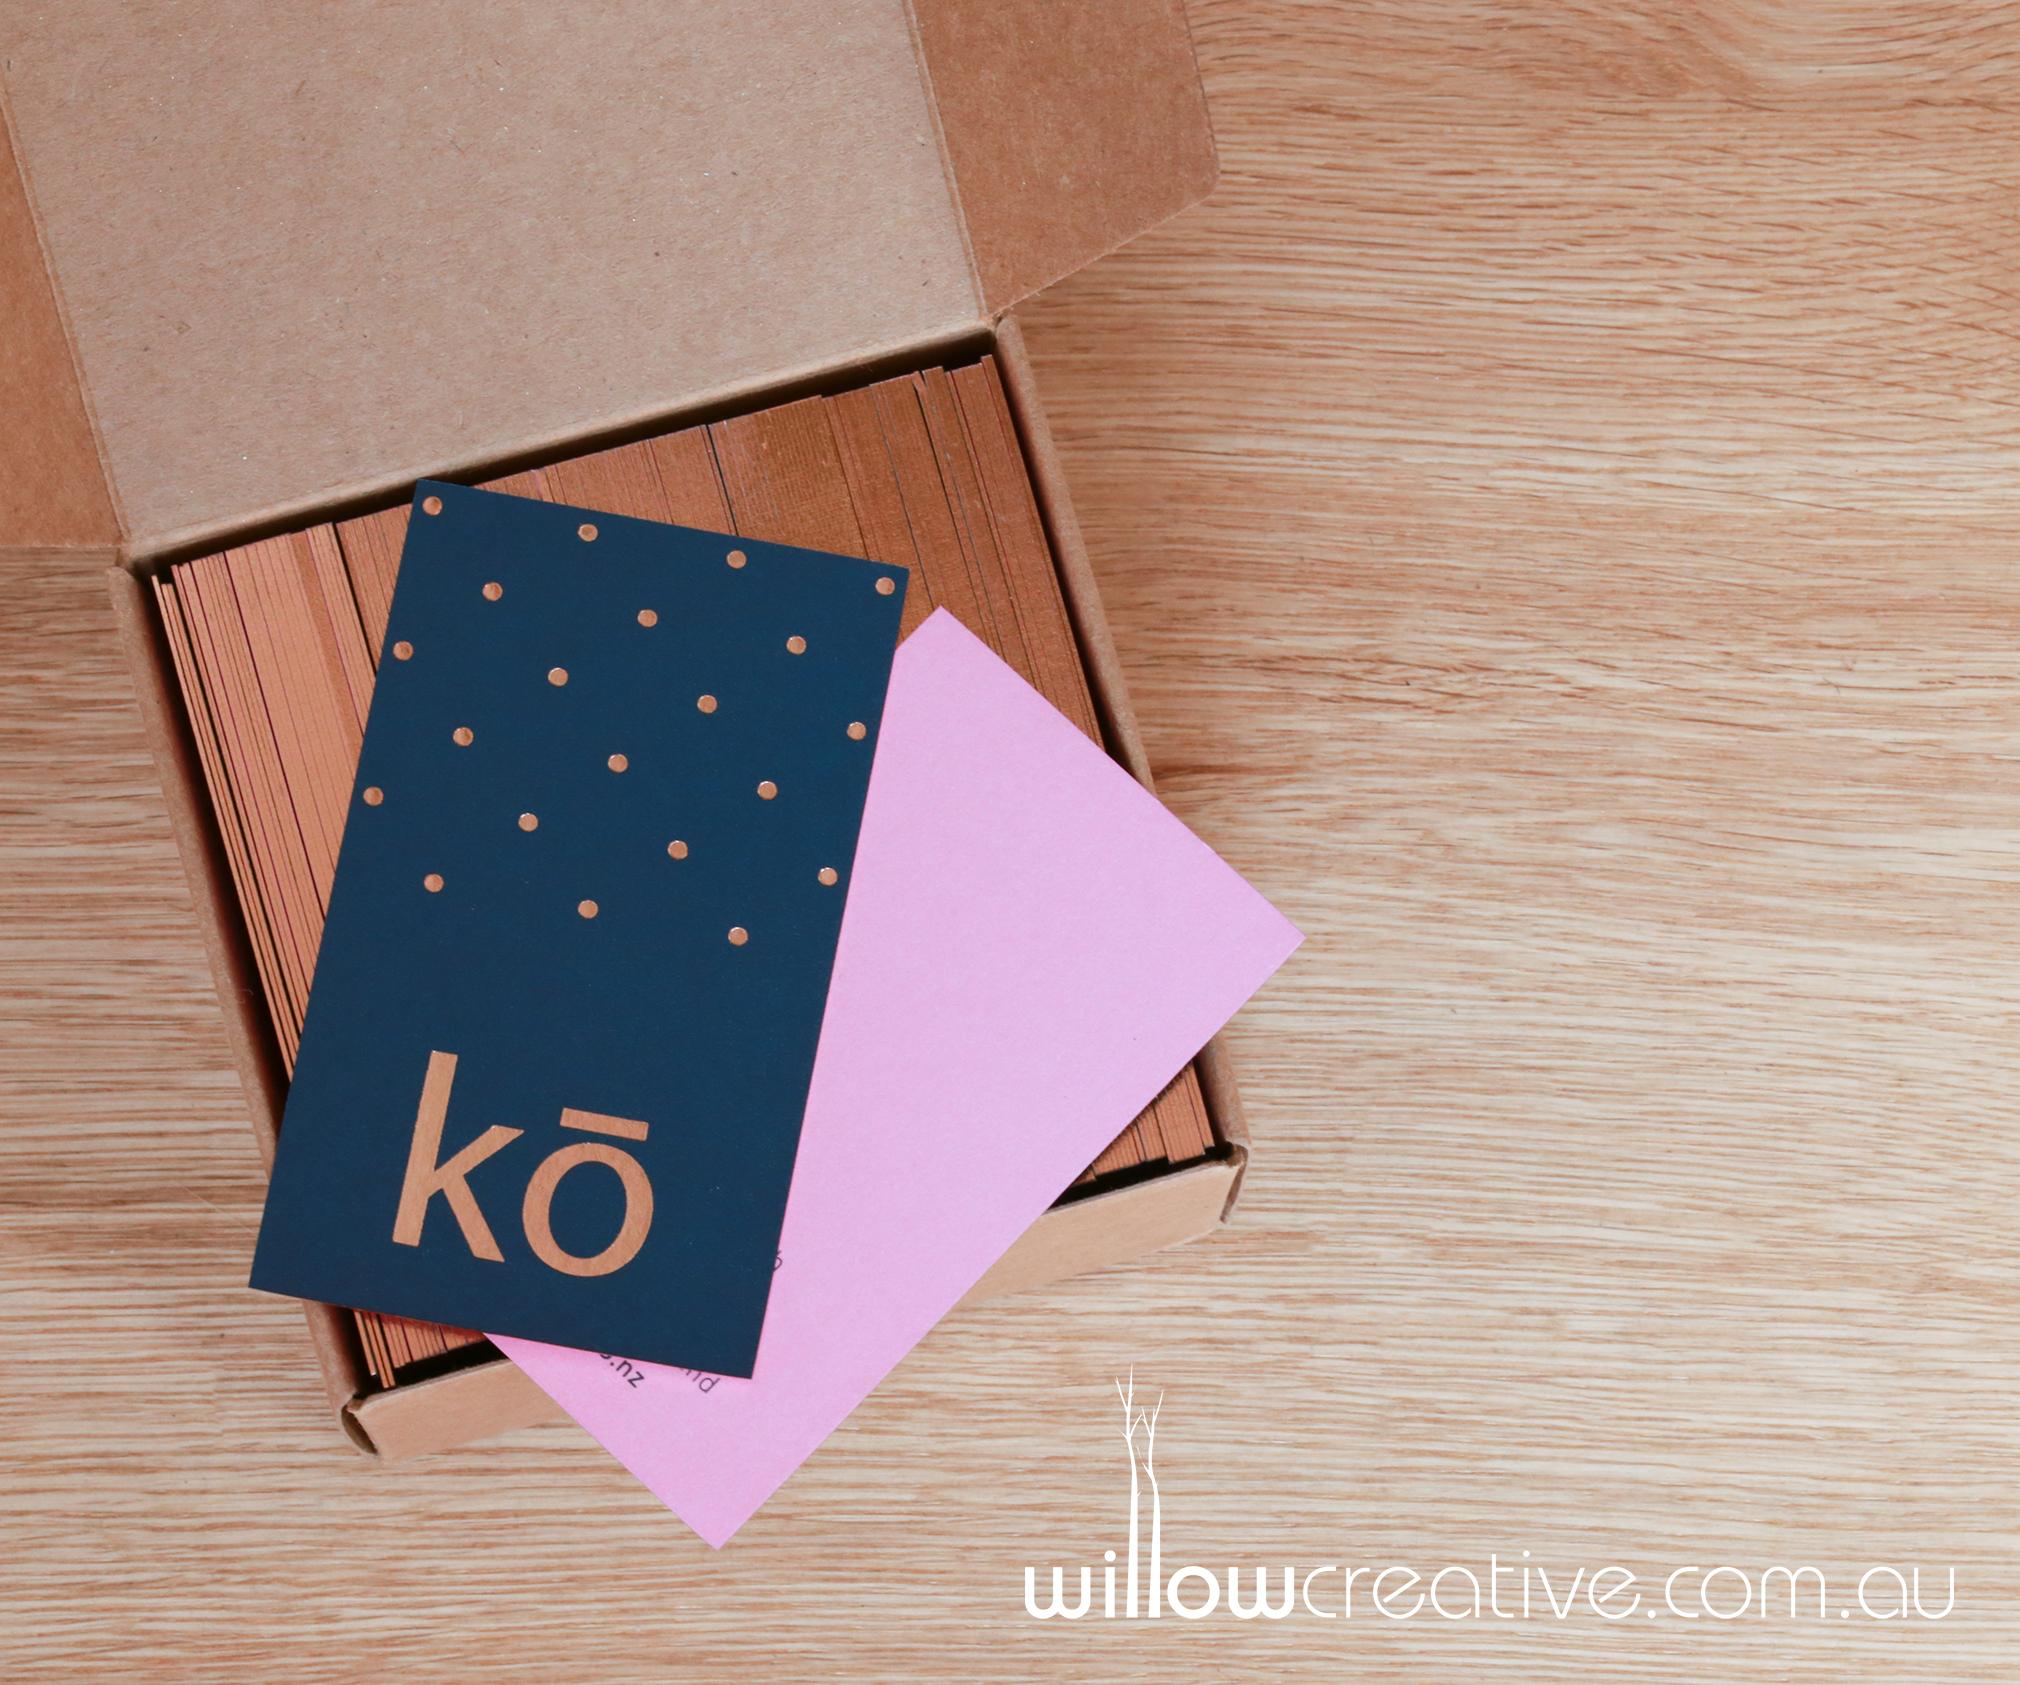 ko cards-1 copy small.jpg